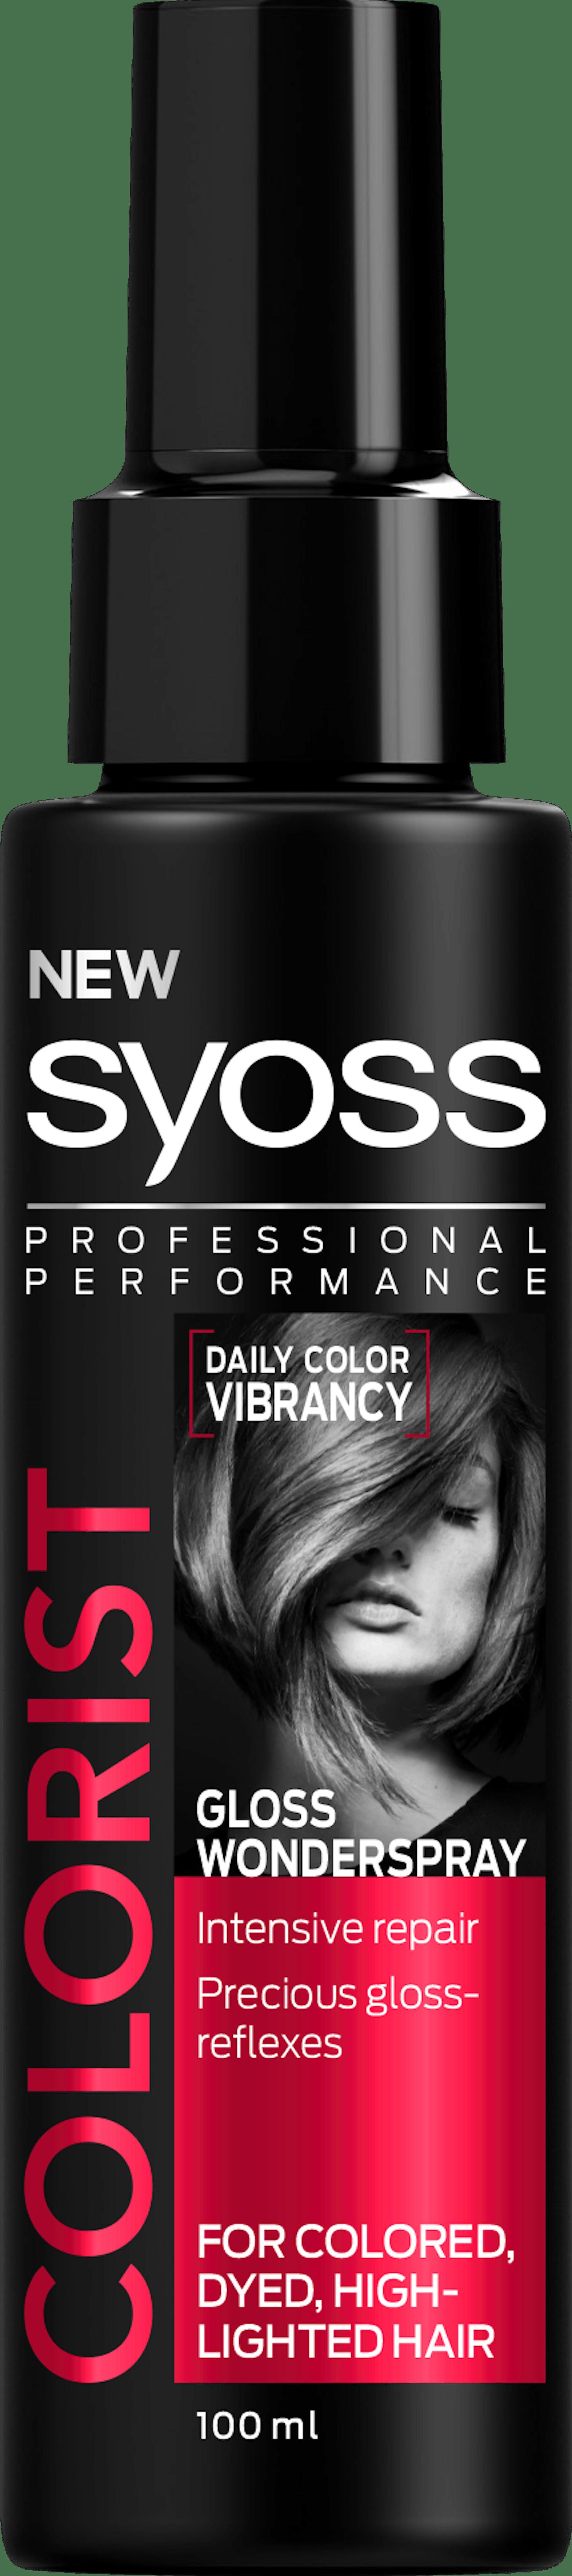 Syoss Colorist Gloss Wonderspray